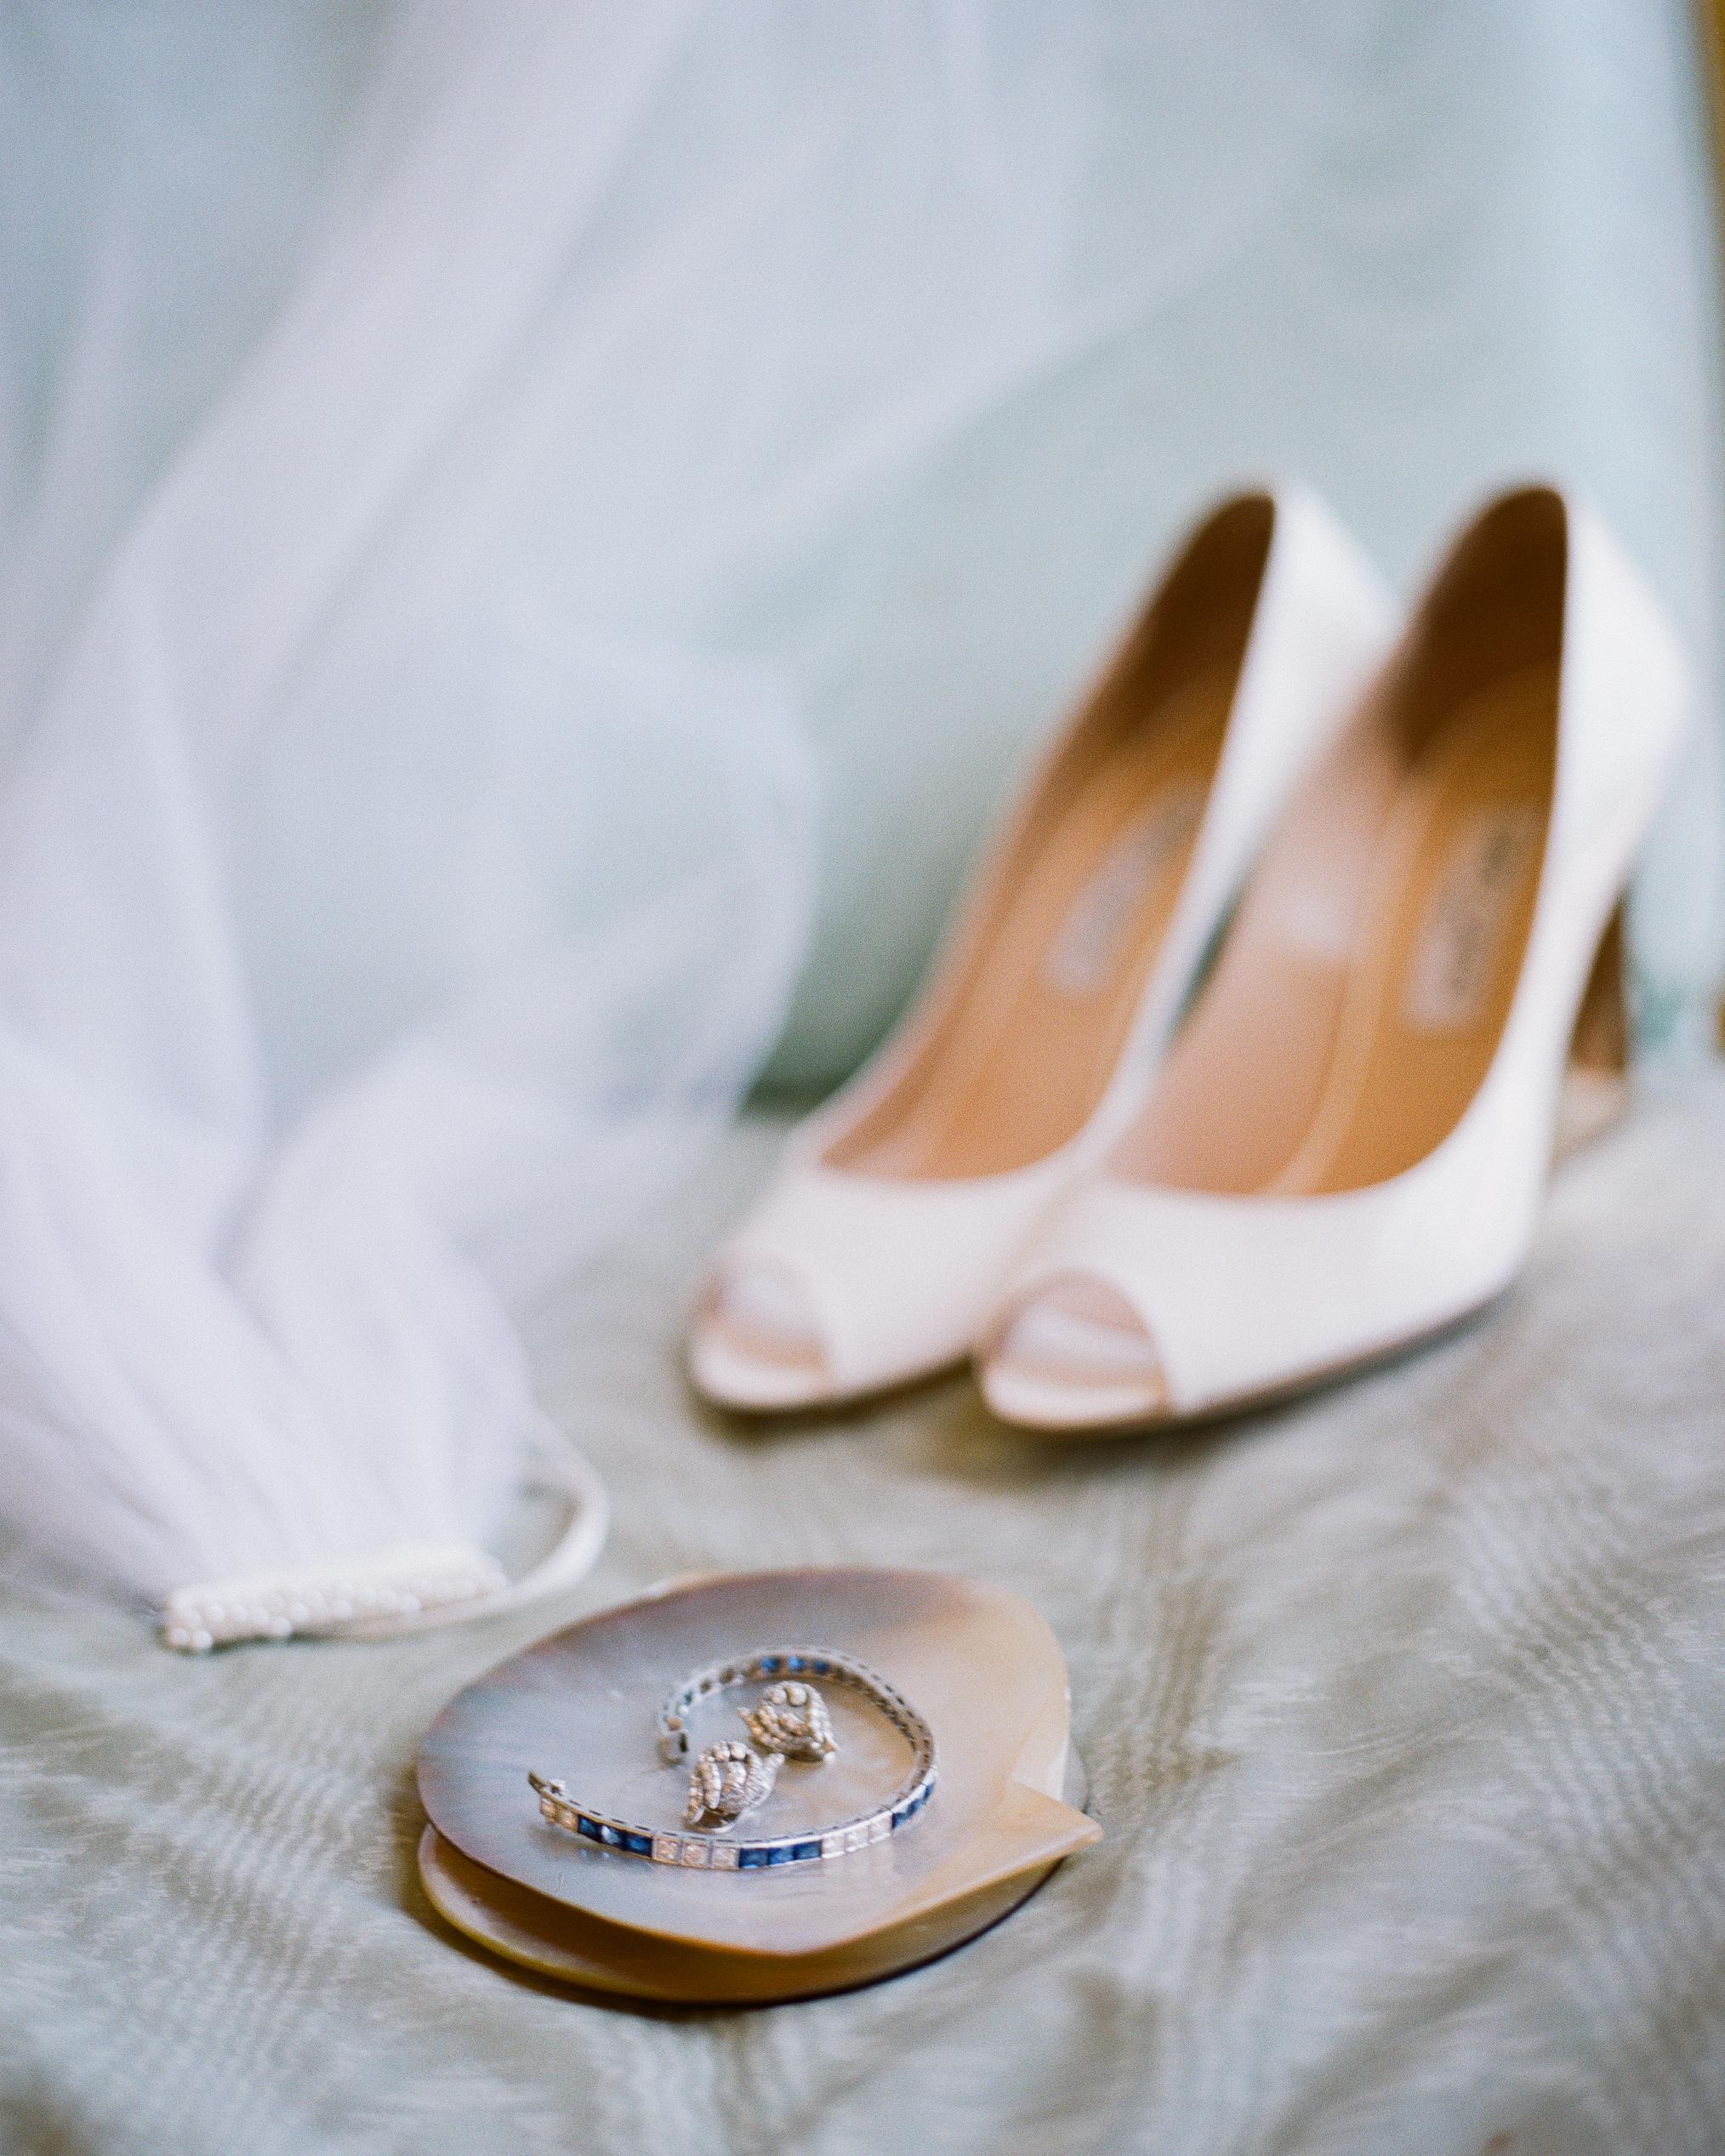 jocelyn-graham-wedding-accessories-0328-s111847-0315.jpg